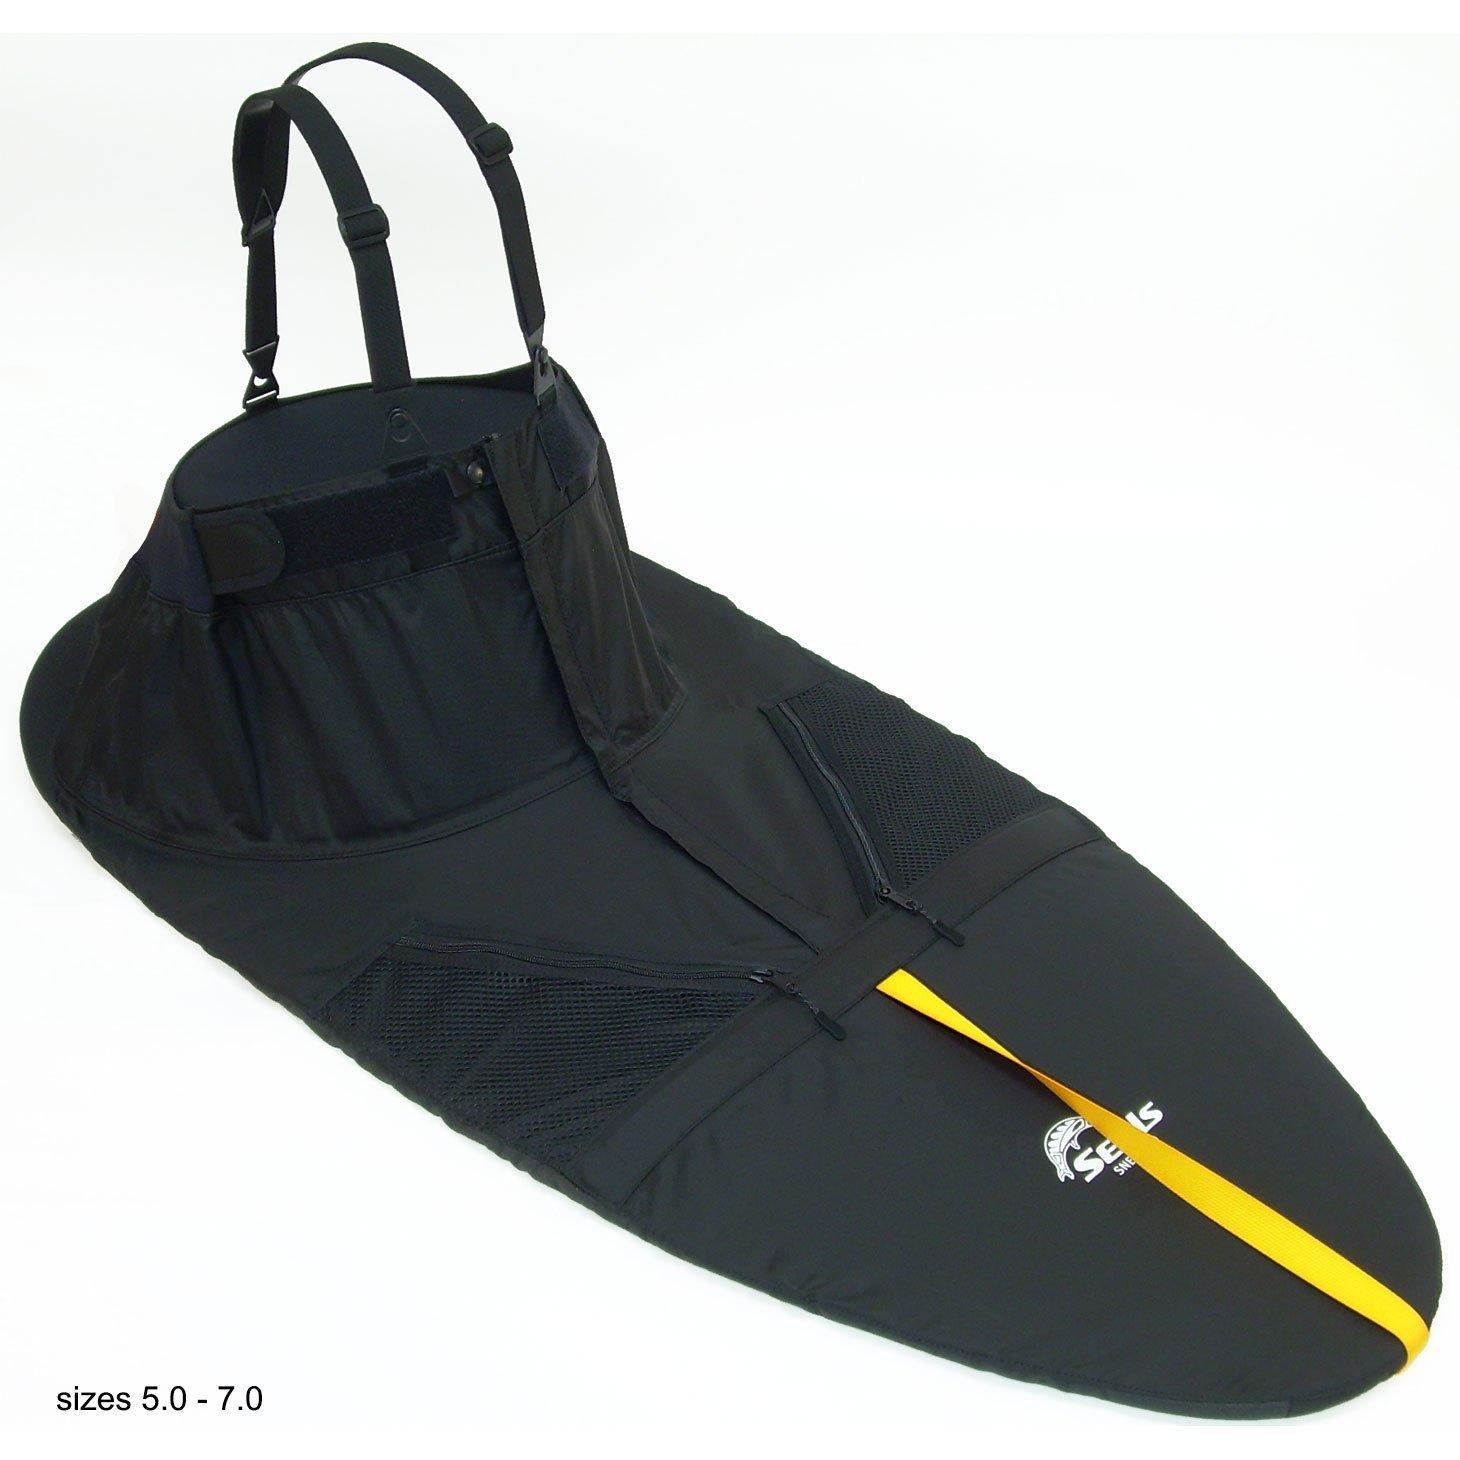 SEALS Sneak Sprayskirt, 5. Black One Size